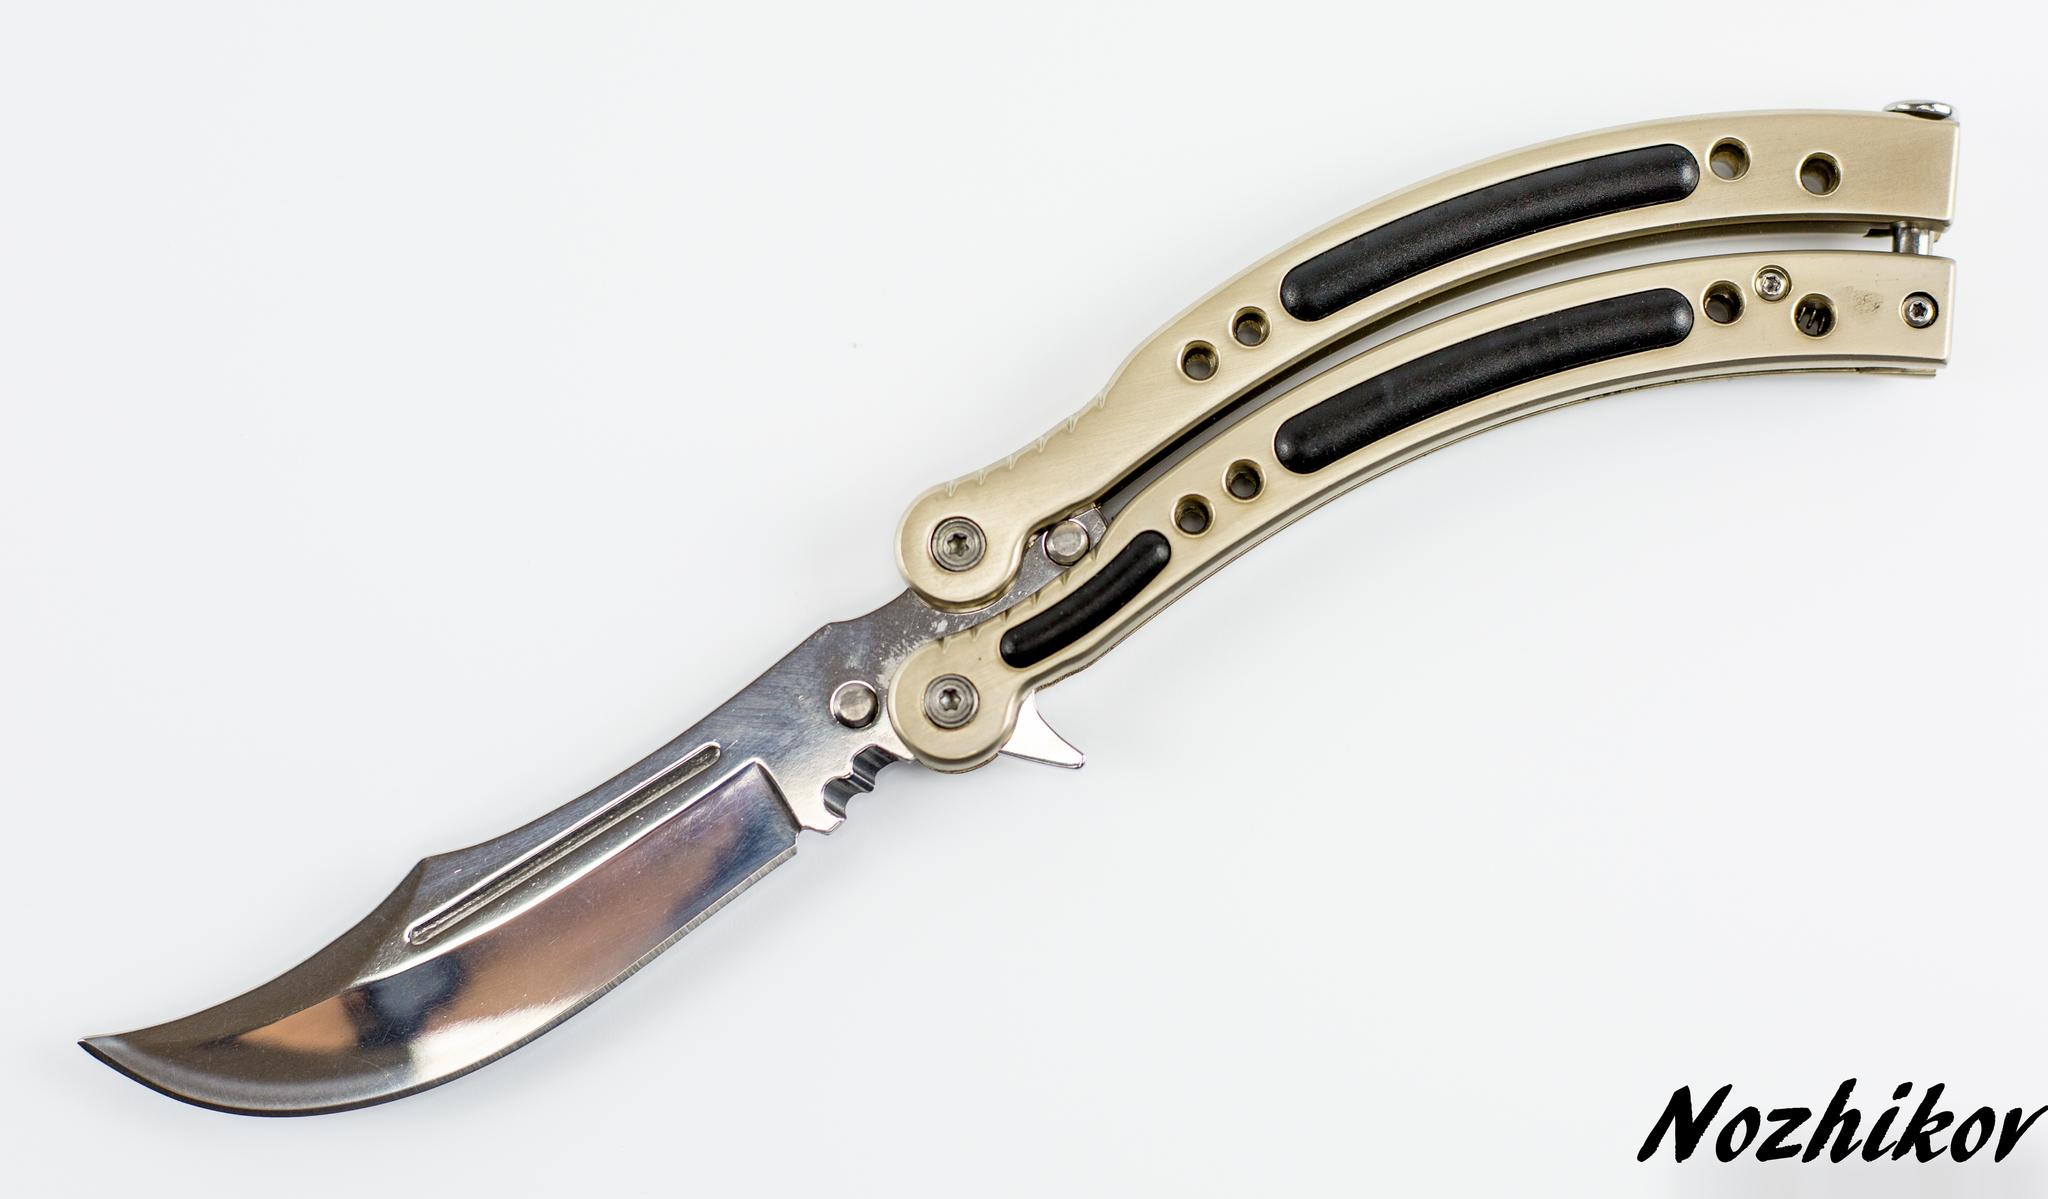 Нож-бабочка (балисонг) CS GO Silver нож бабочка балисонг cs go камуфляж лес